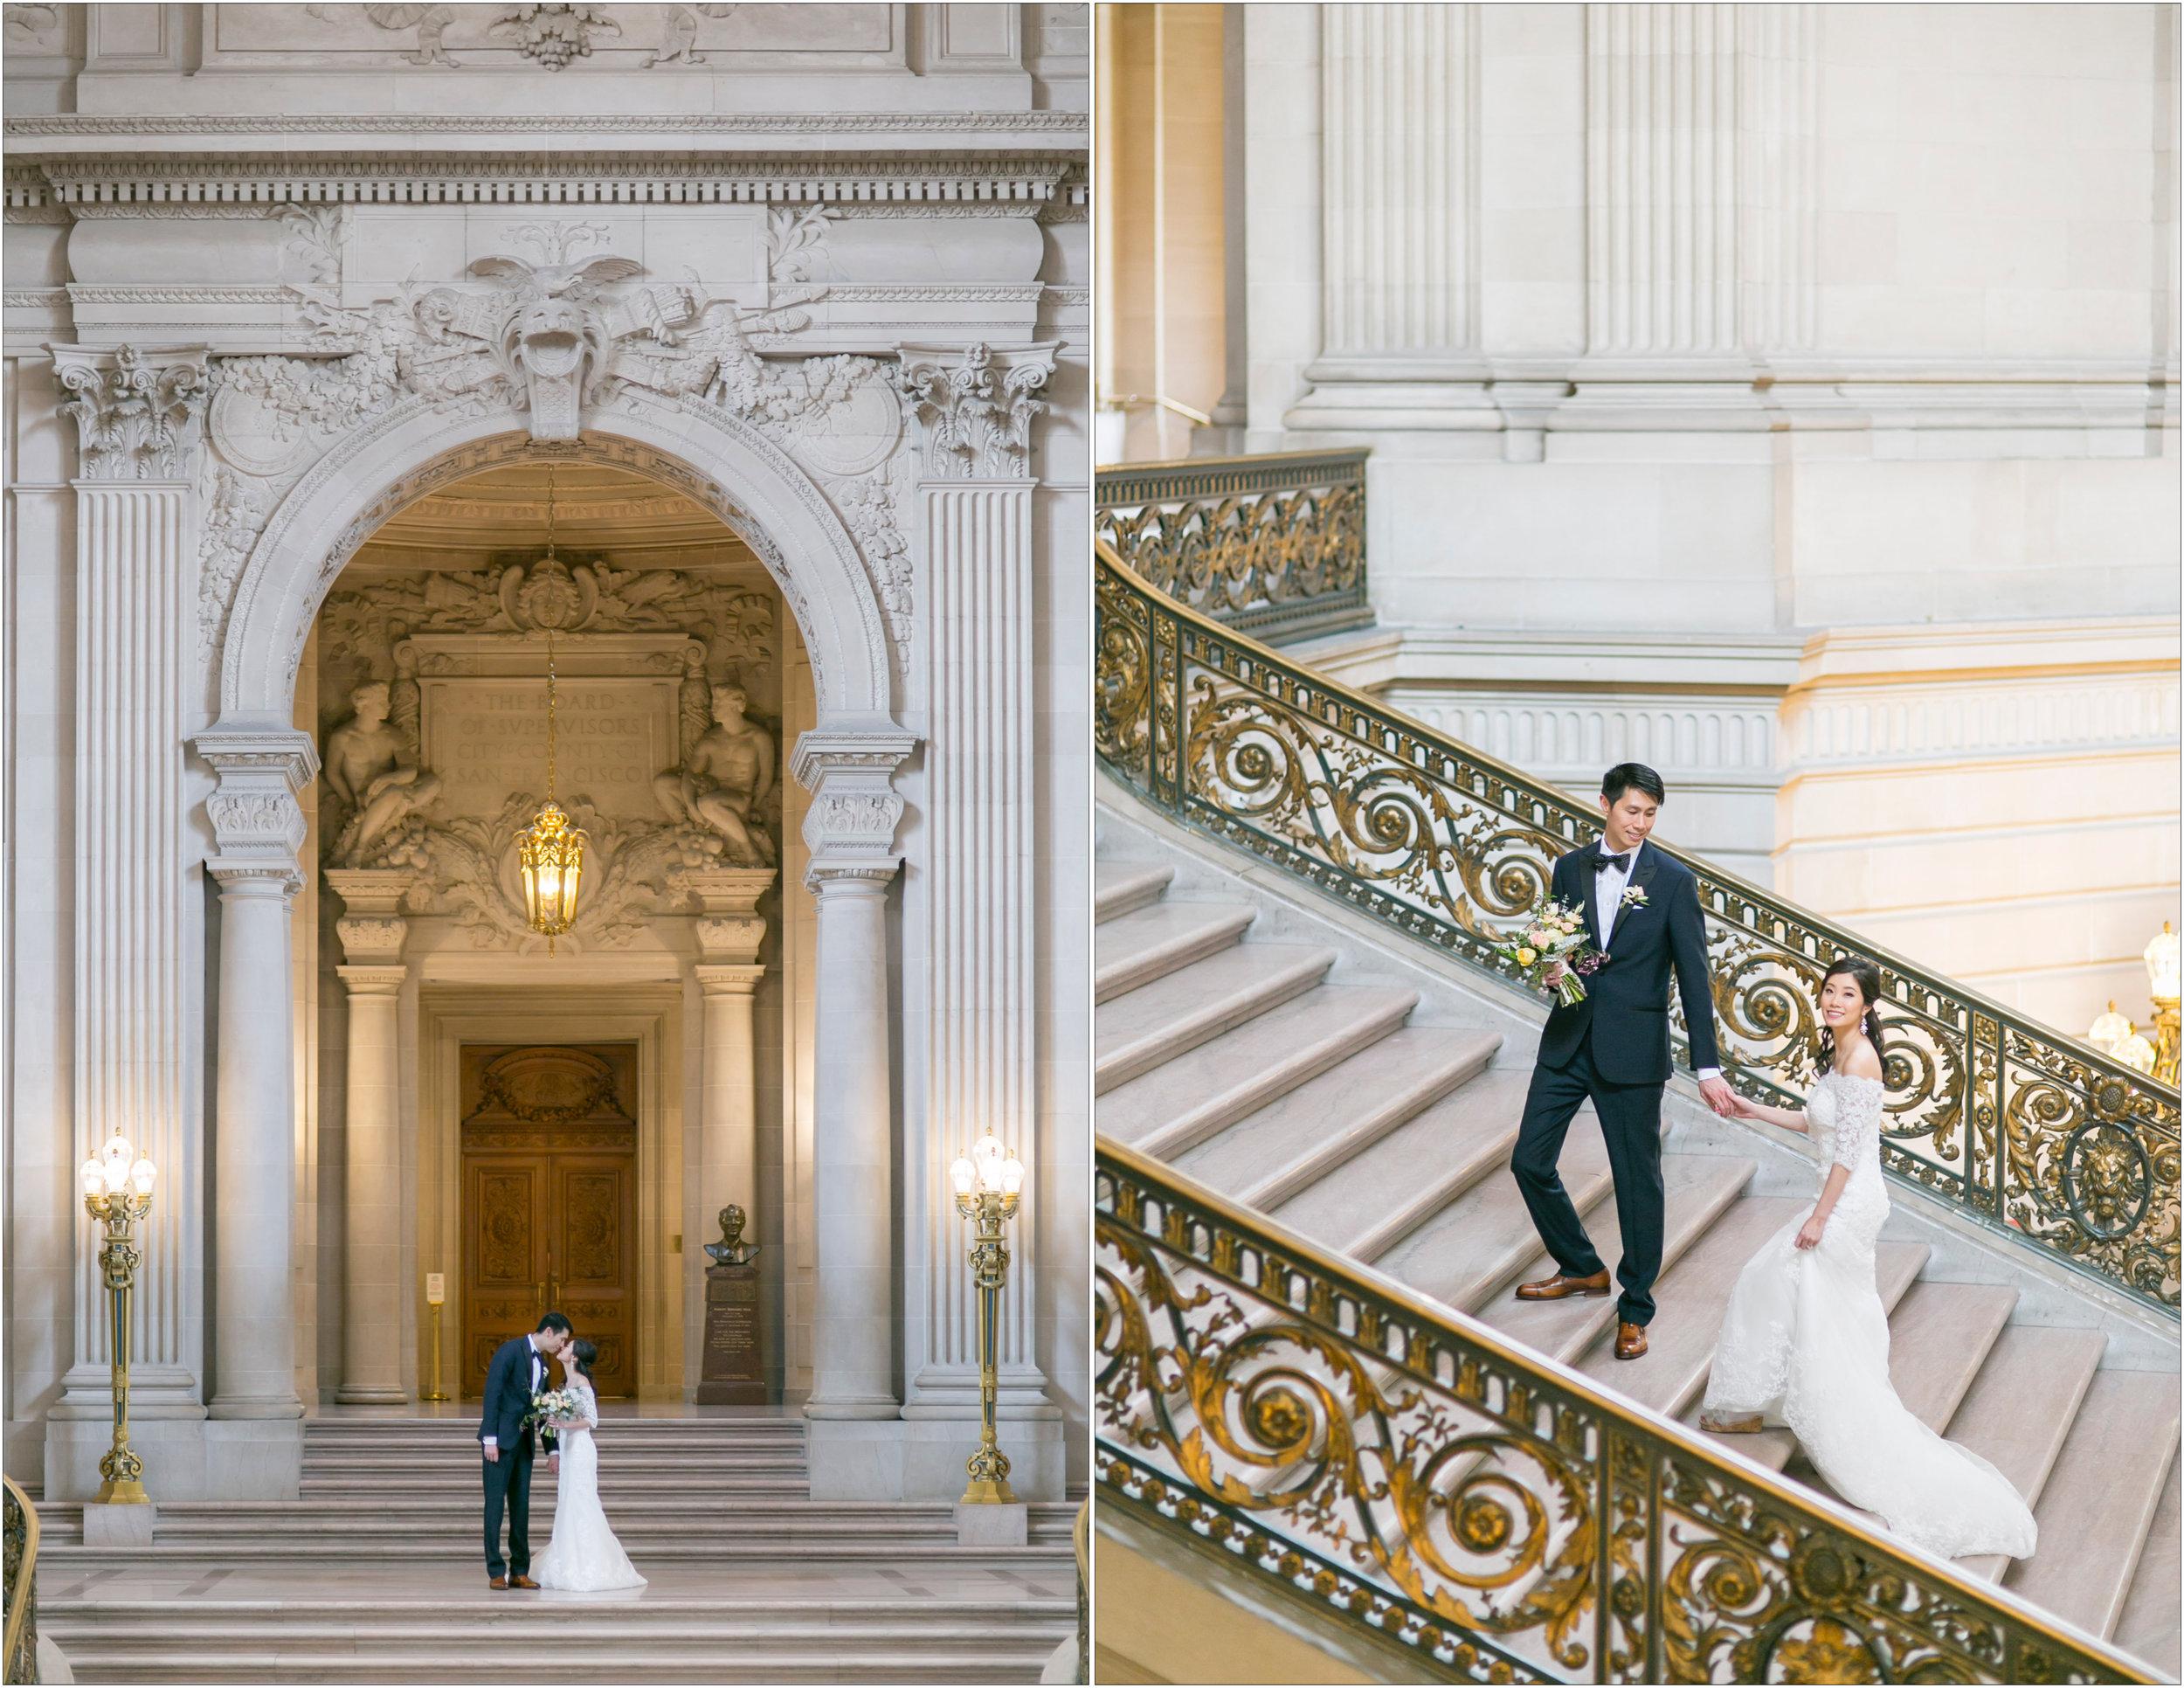 San Francisco City Hall Wedding Photographer - Michelle Chang Photography